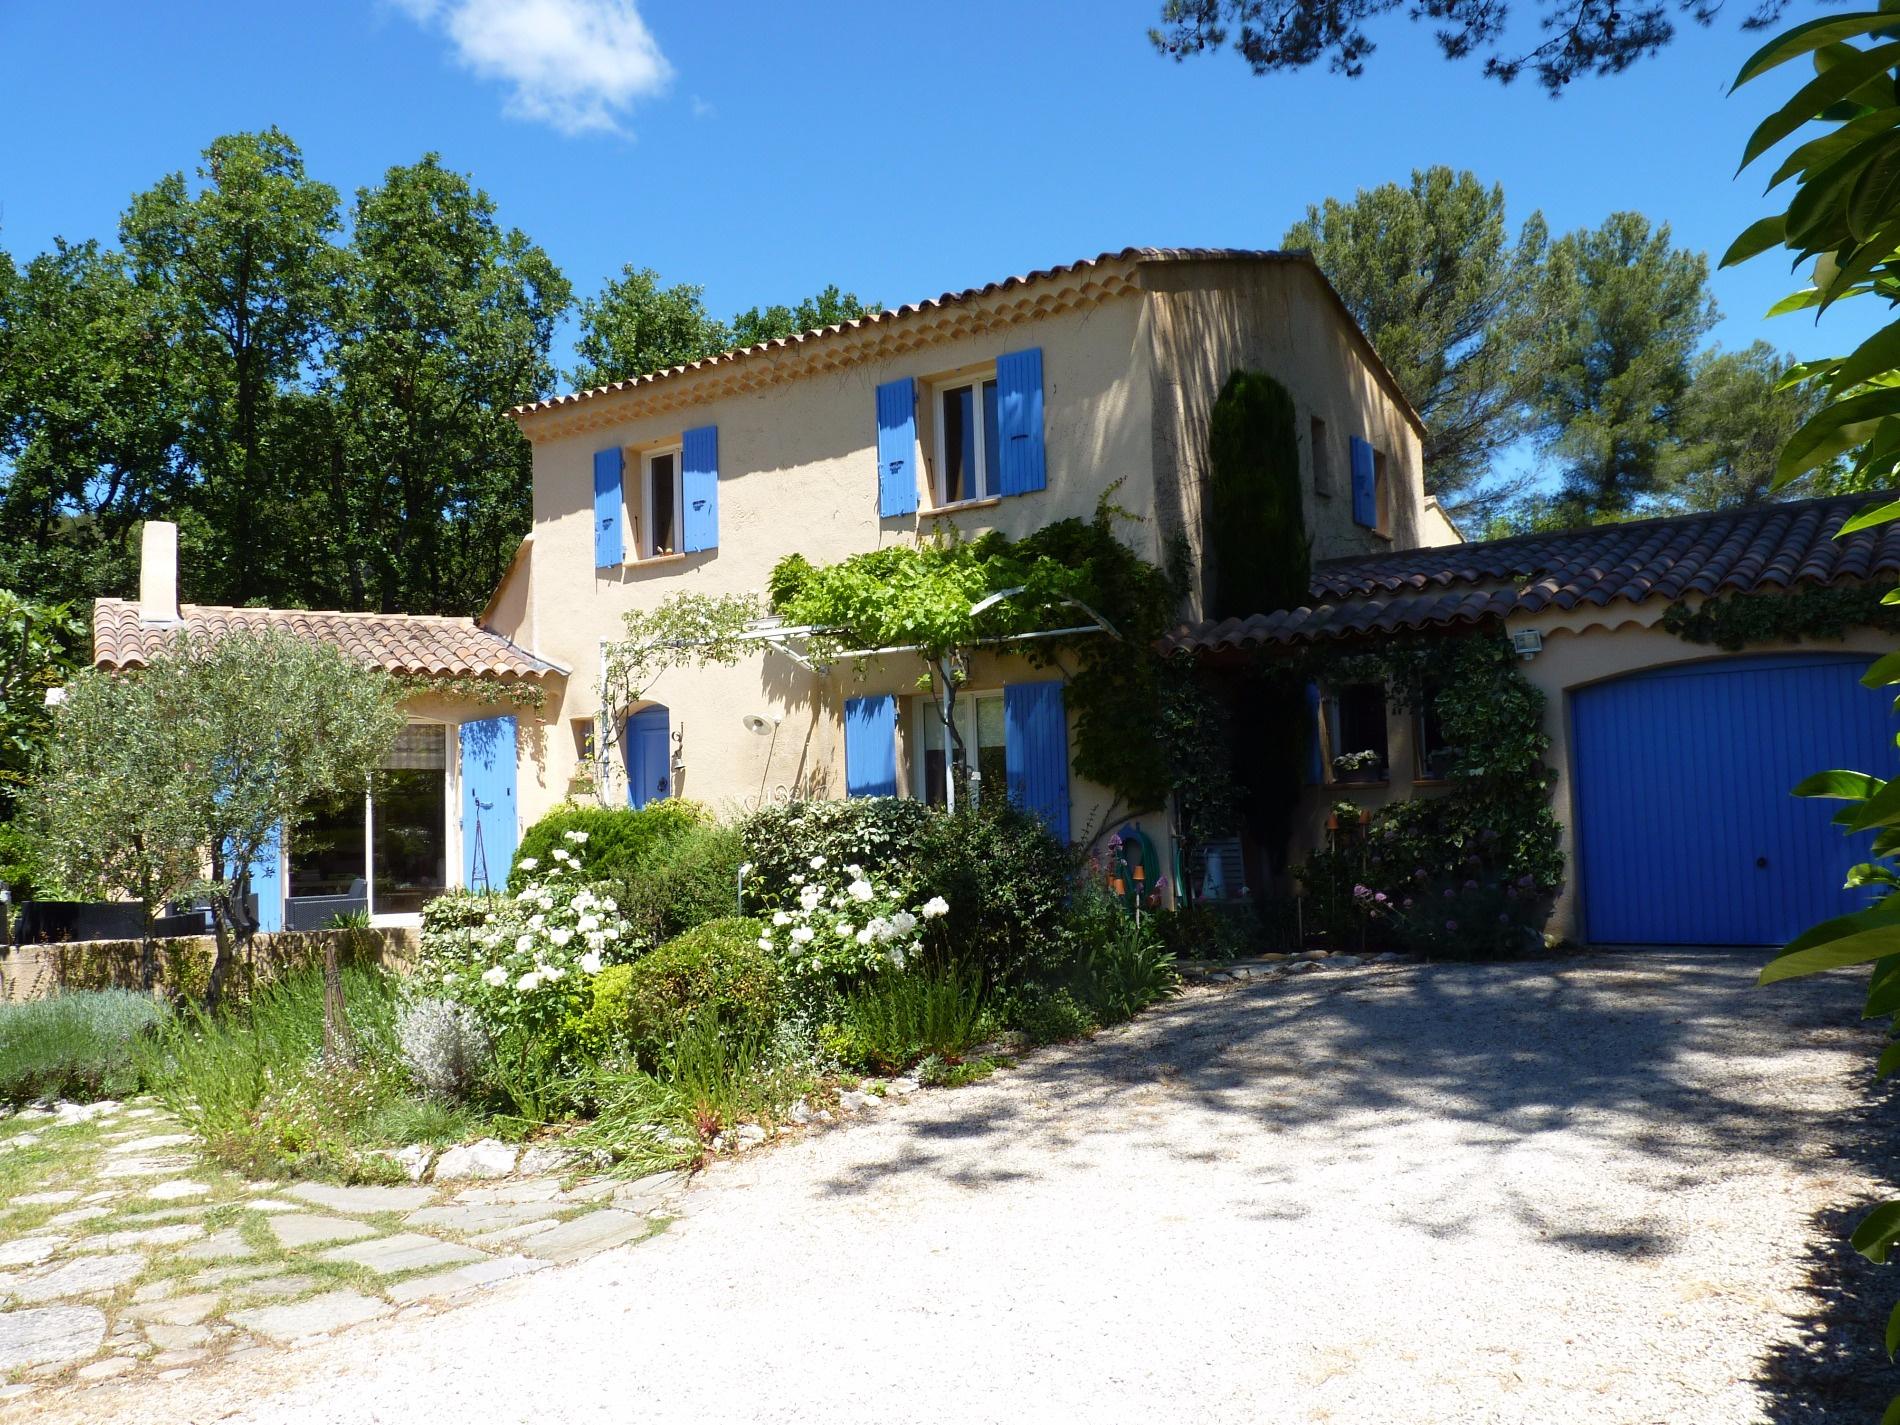 Habitaix agence immobili re aix en provence achat maison for Achat maison aix en provence